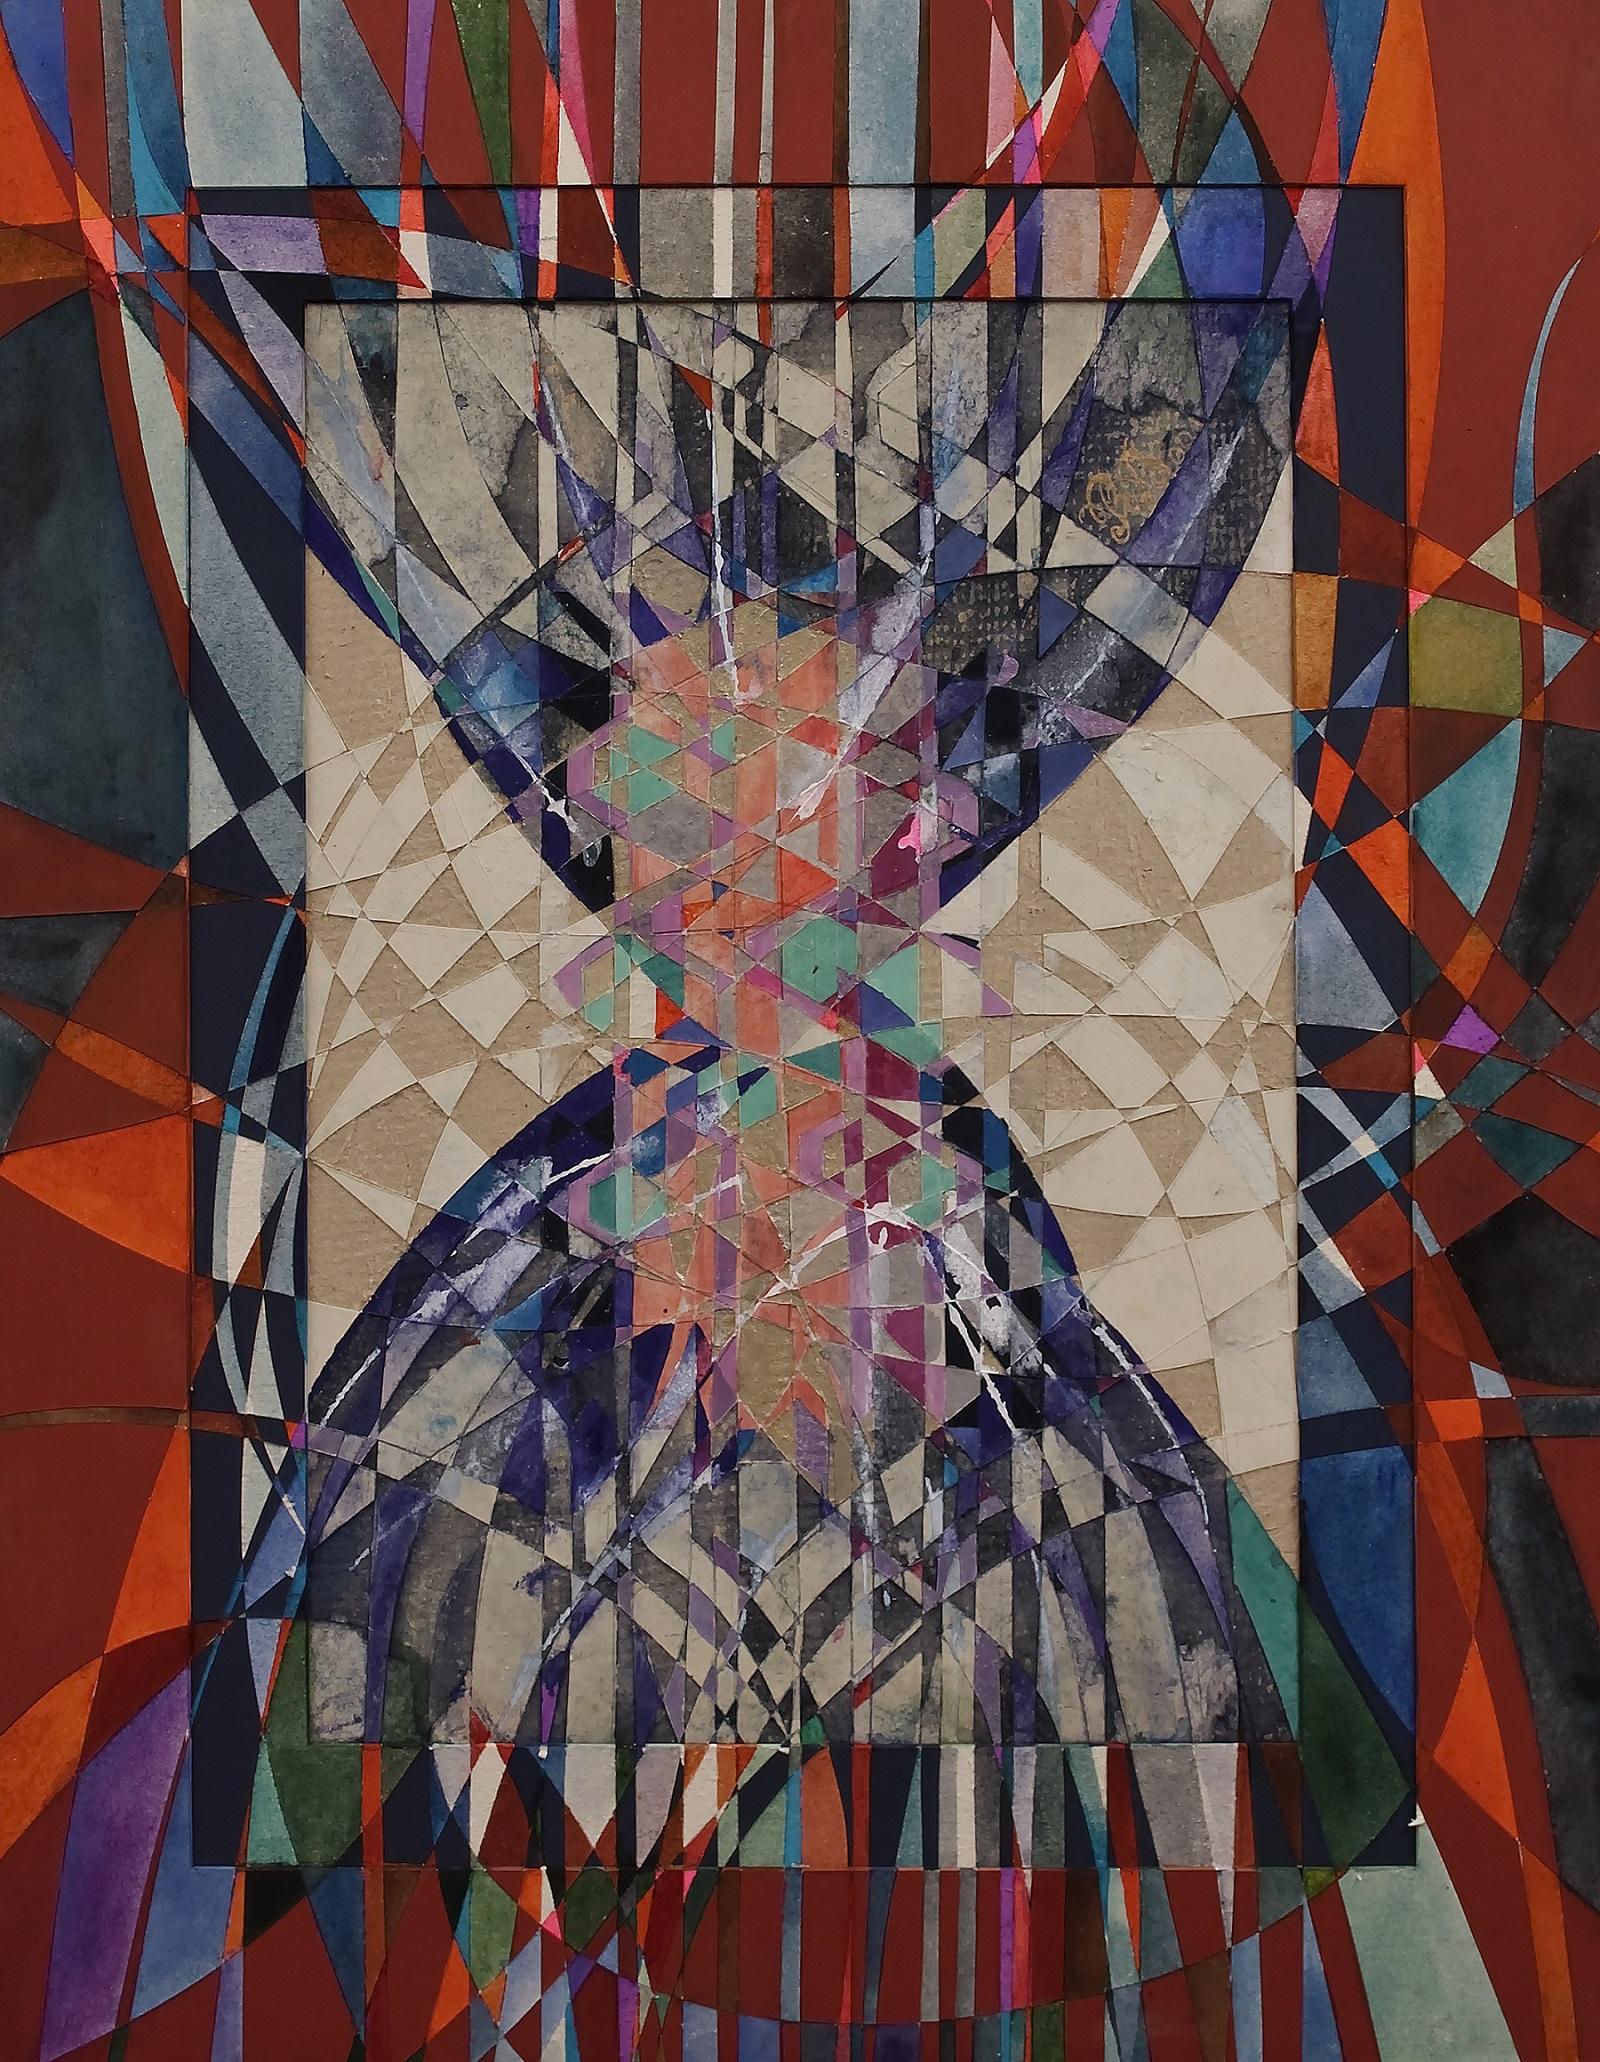 """Hourglass"" Rumyanka Bozhkova Drawing Engraving on Multilayer Cardboard"